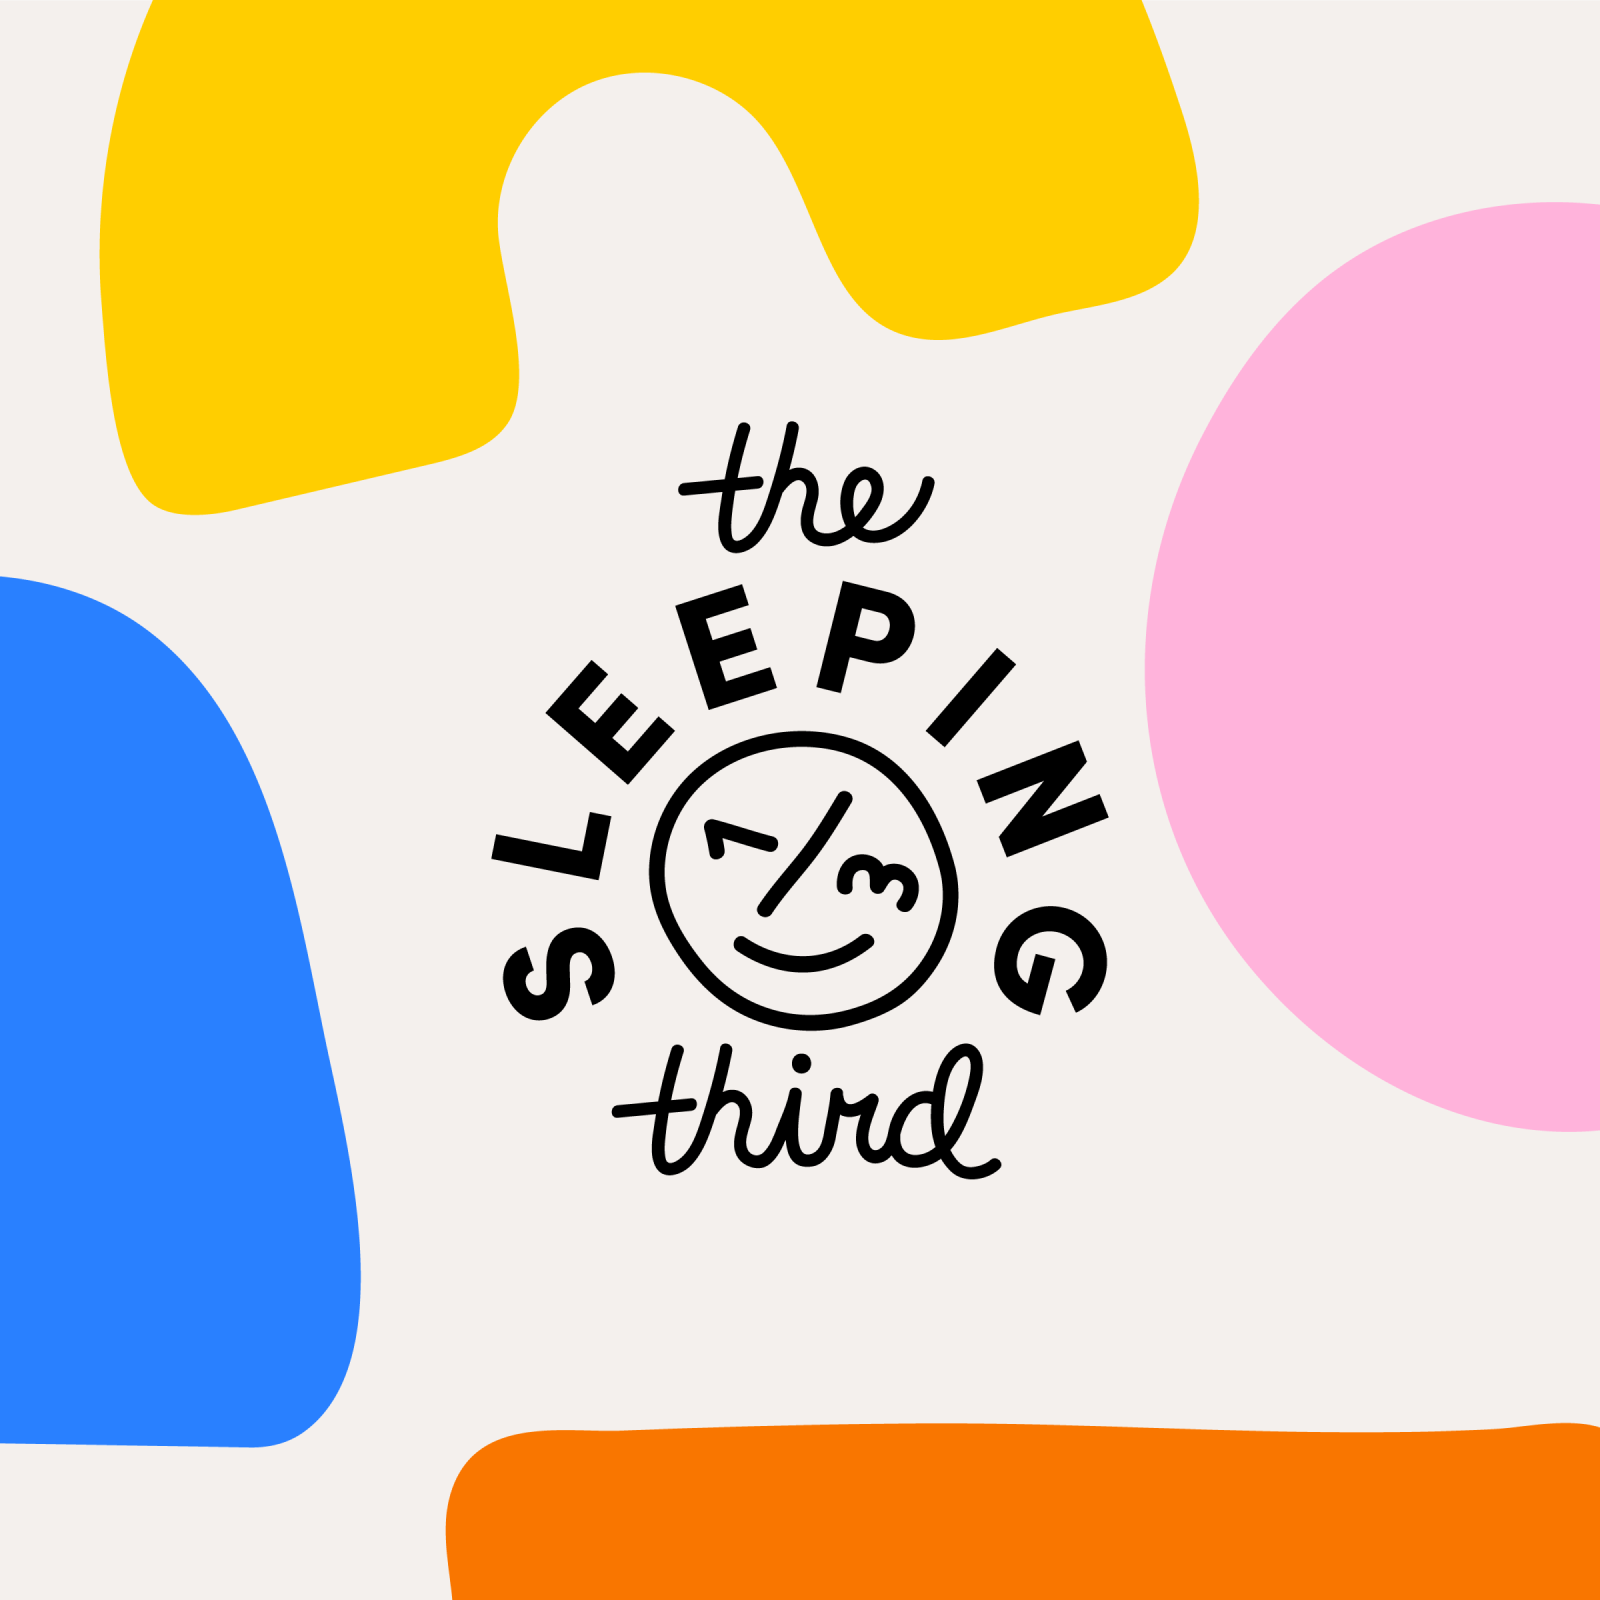 The Sleeping Third - Brand Design